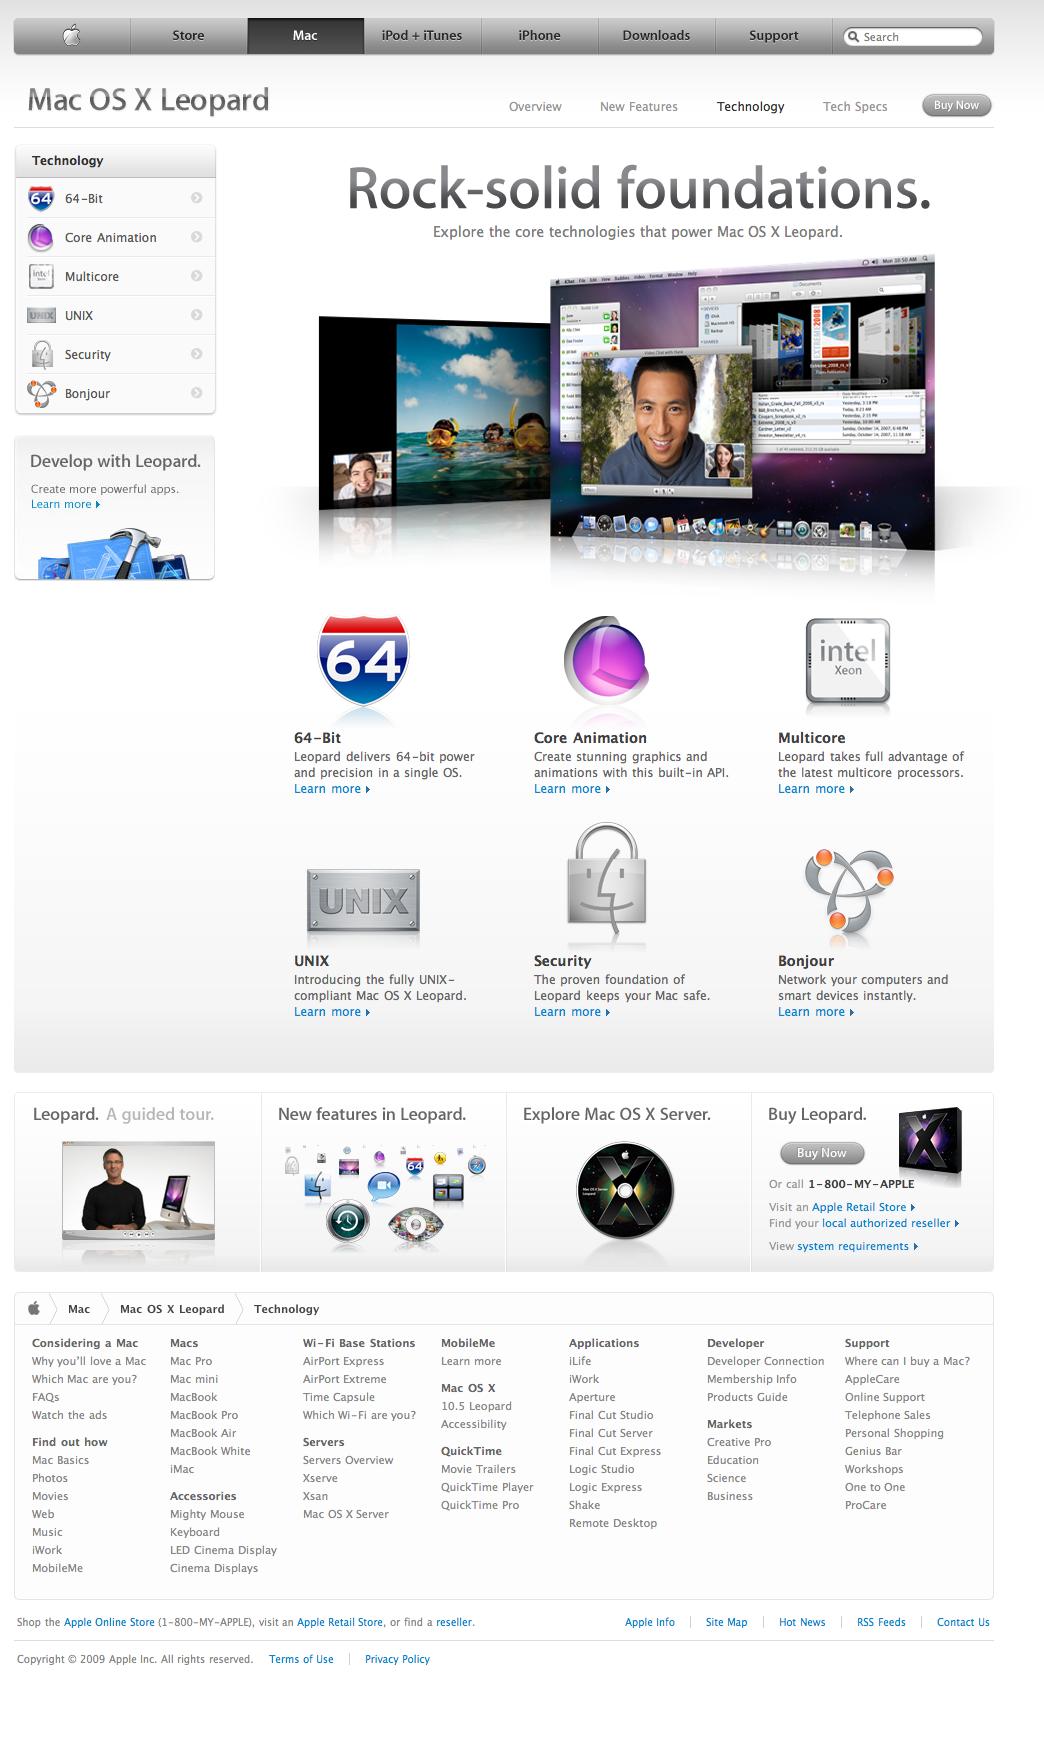 Apple - Mac OS X Leopard - Technology (08 01 2009) | Apple com sick